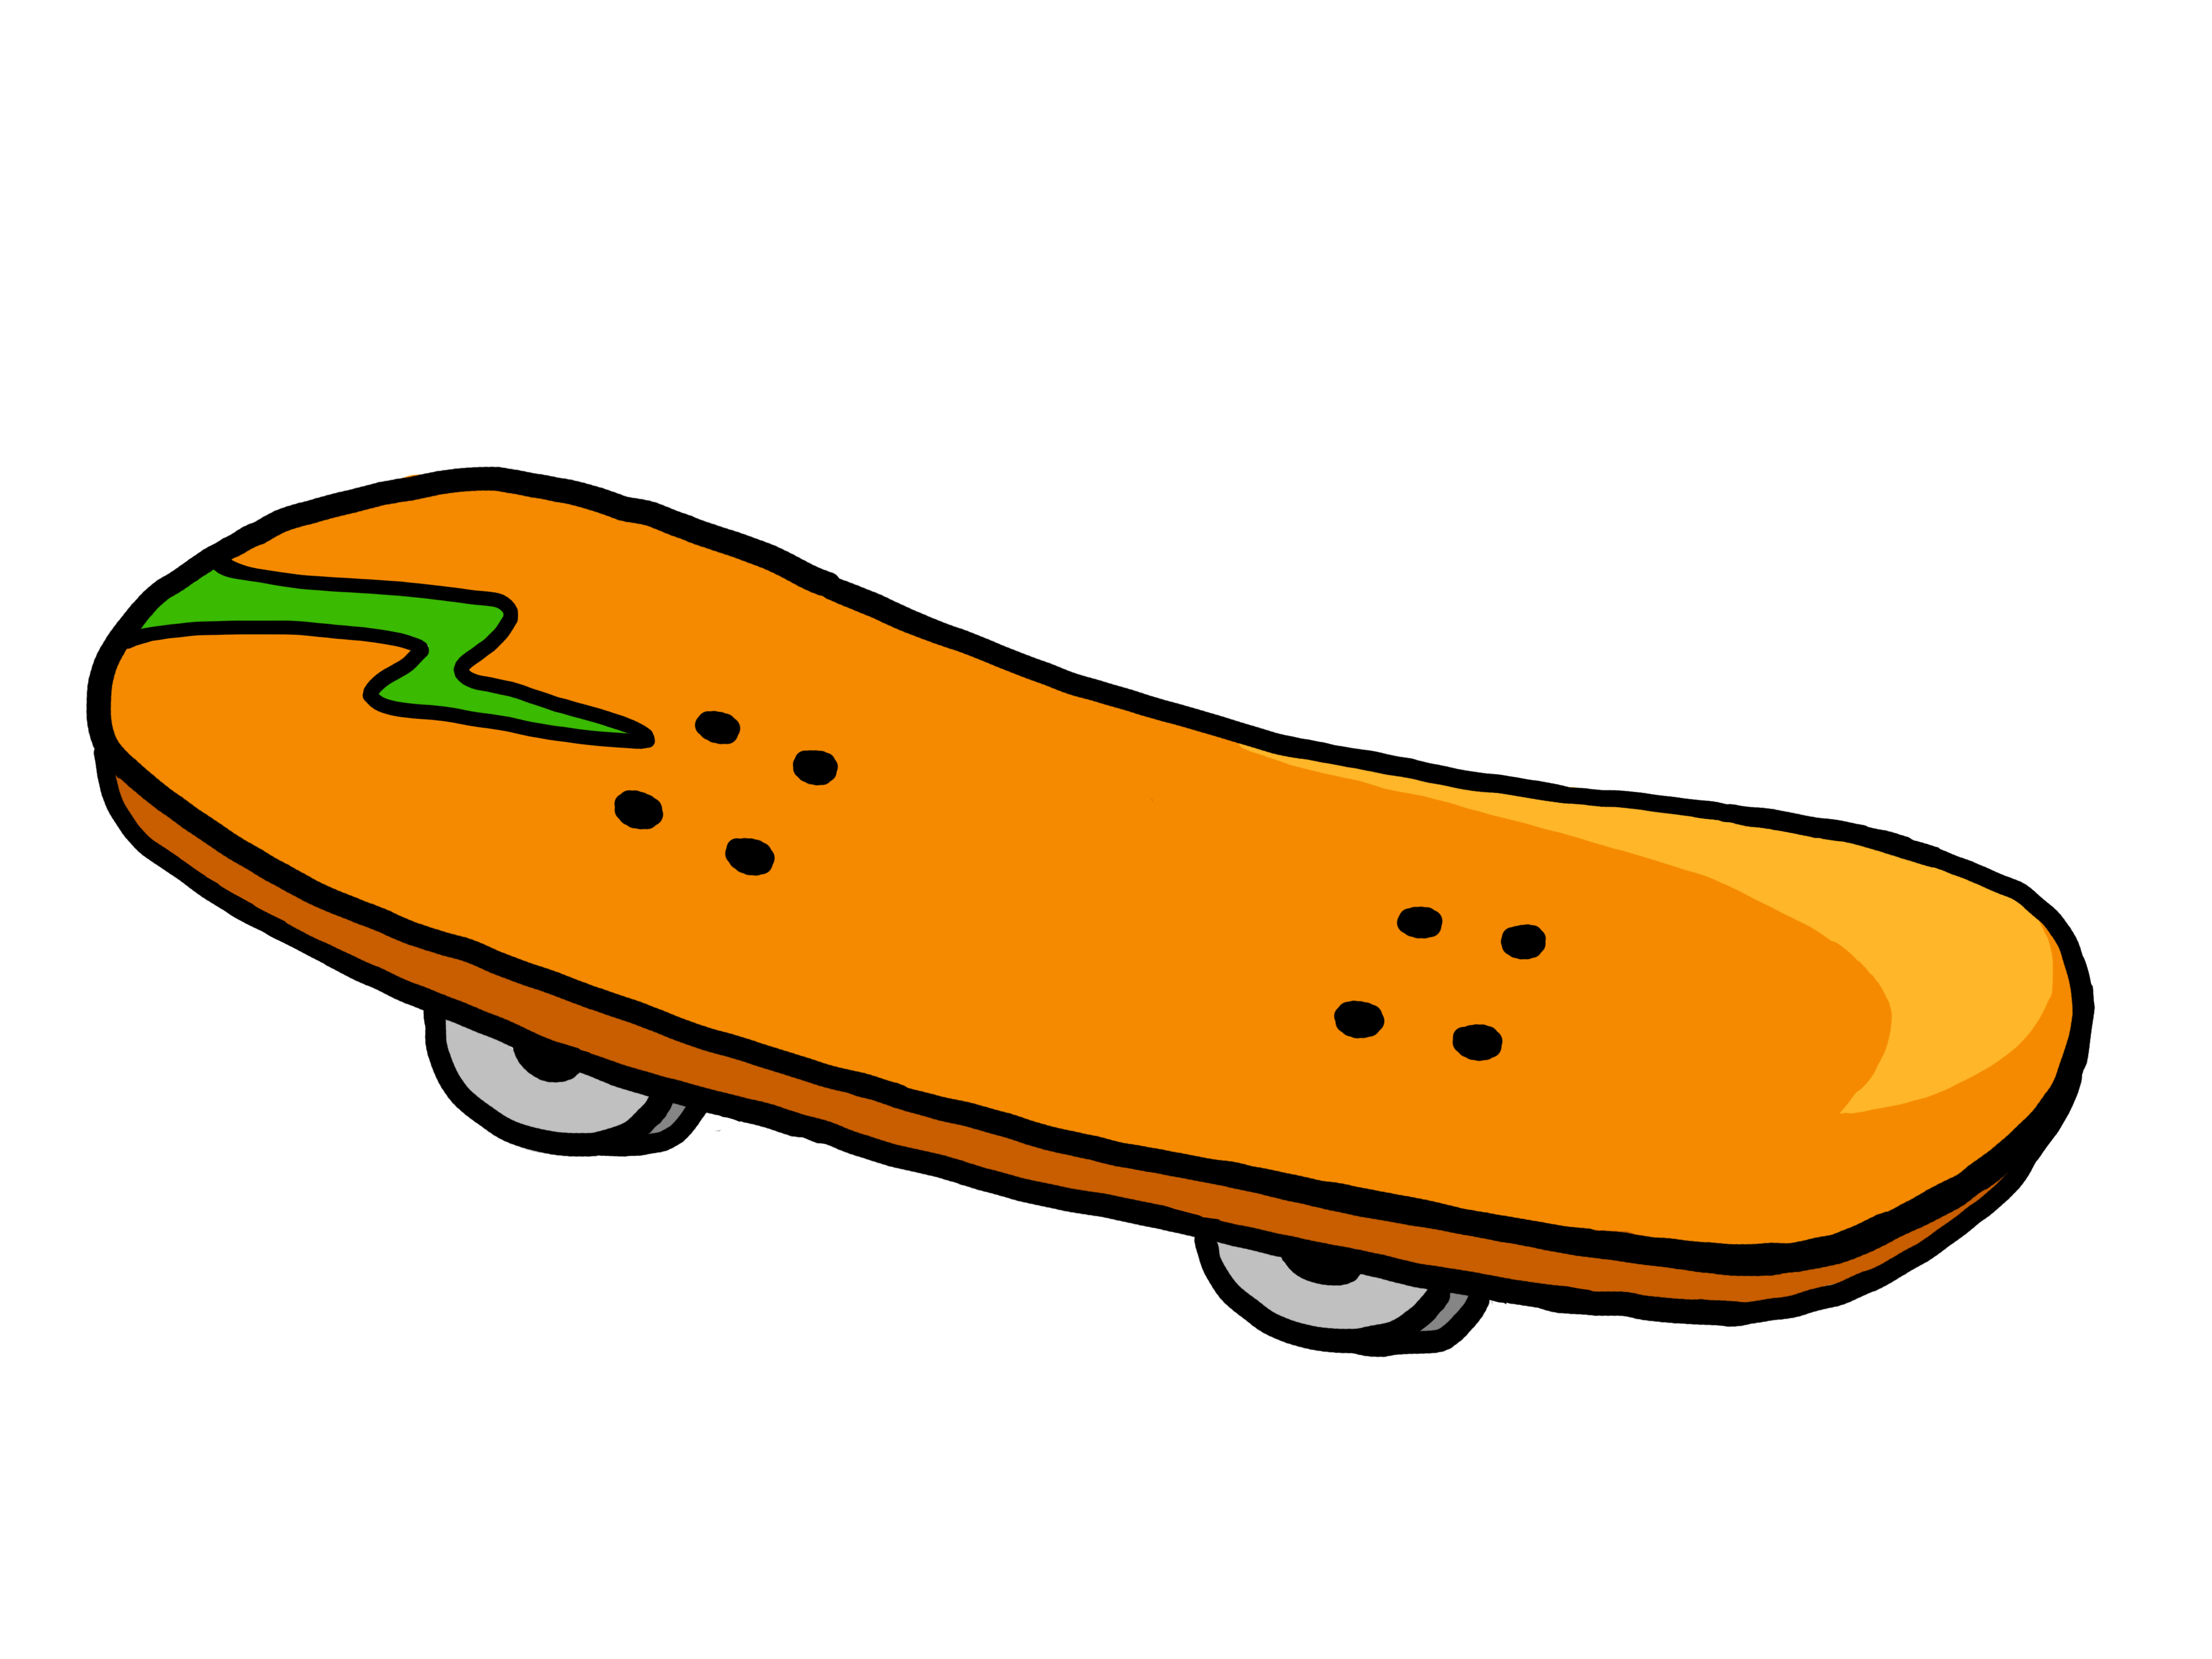 Skateboard Free Clipart #1